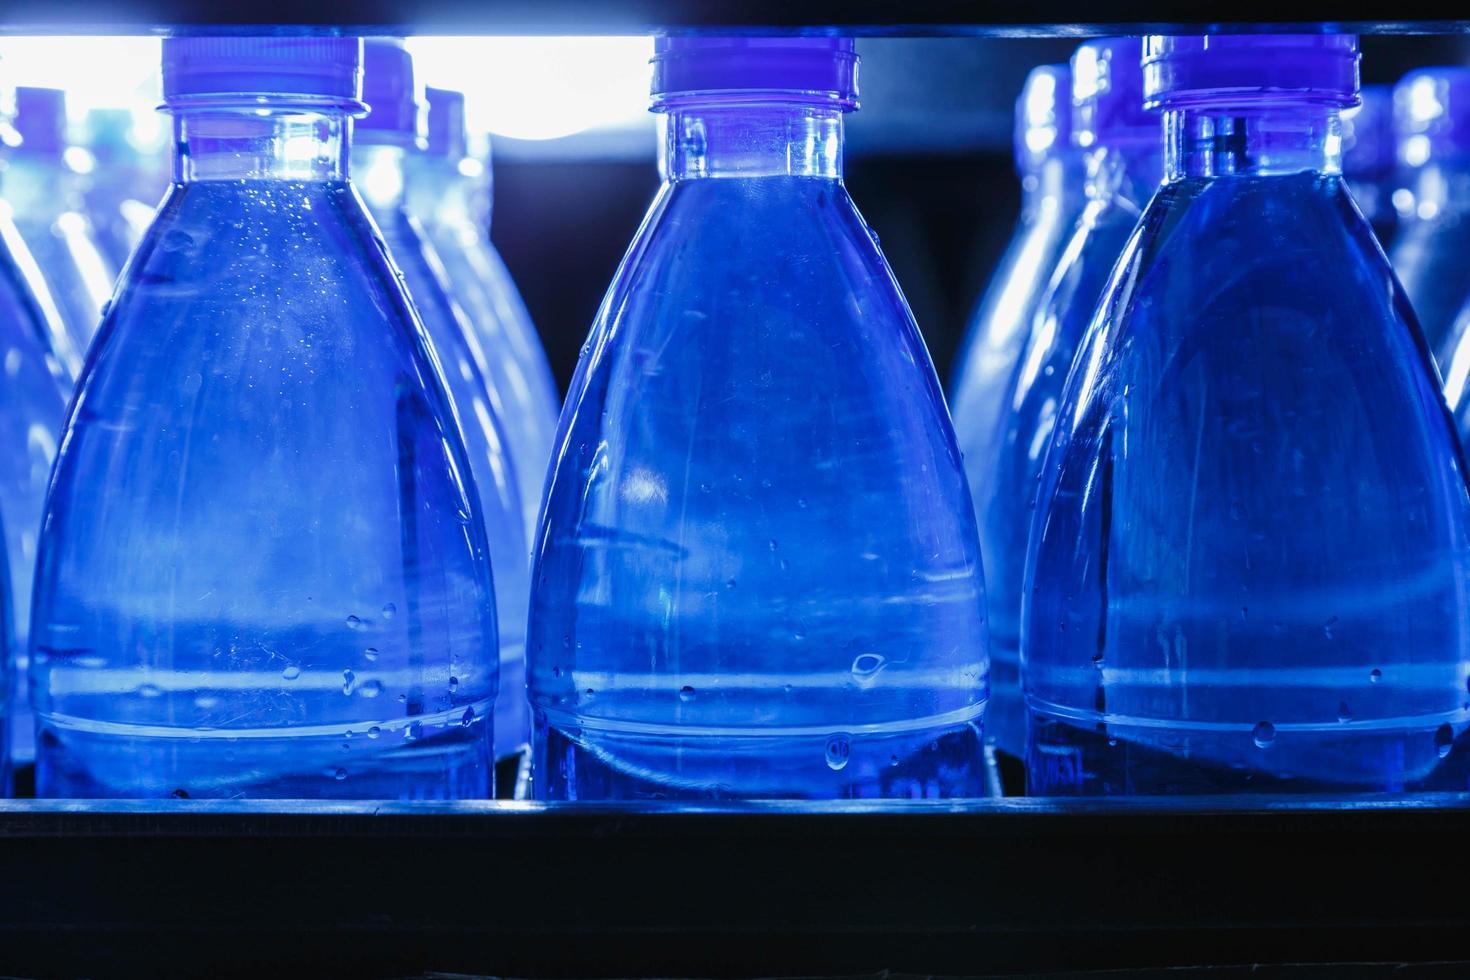 blauwe flessen water foto